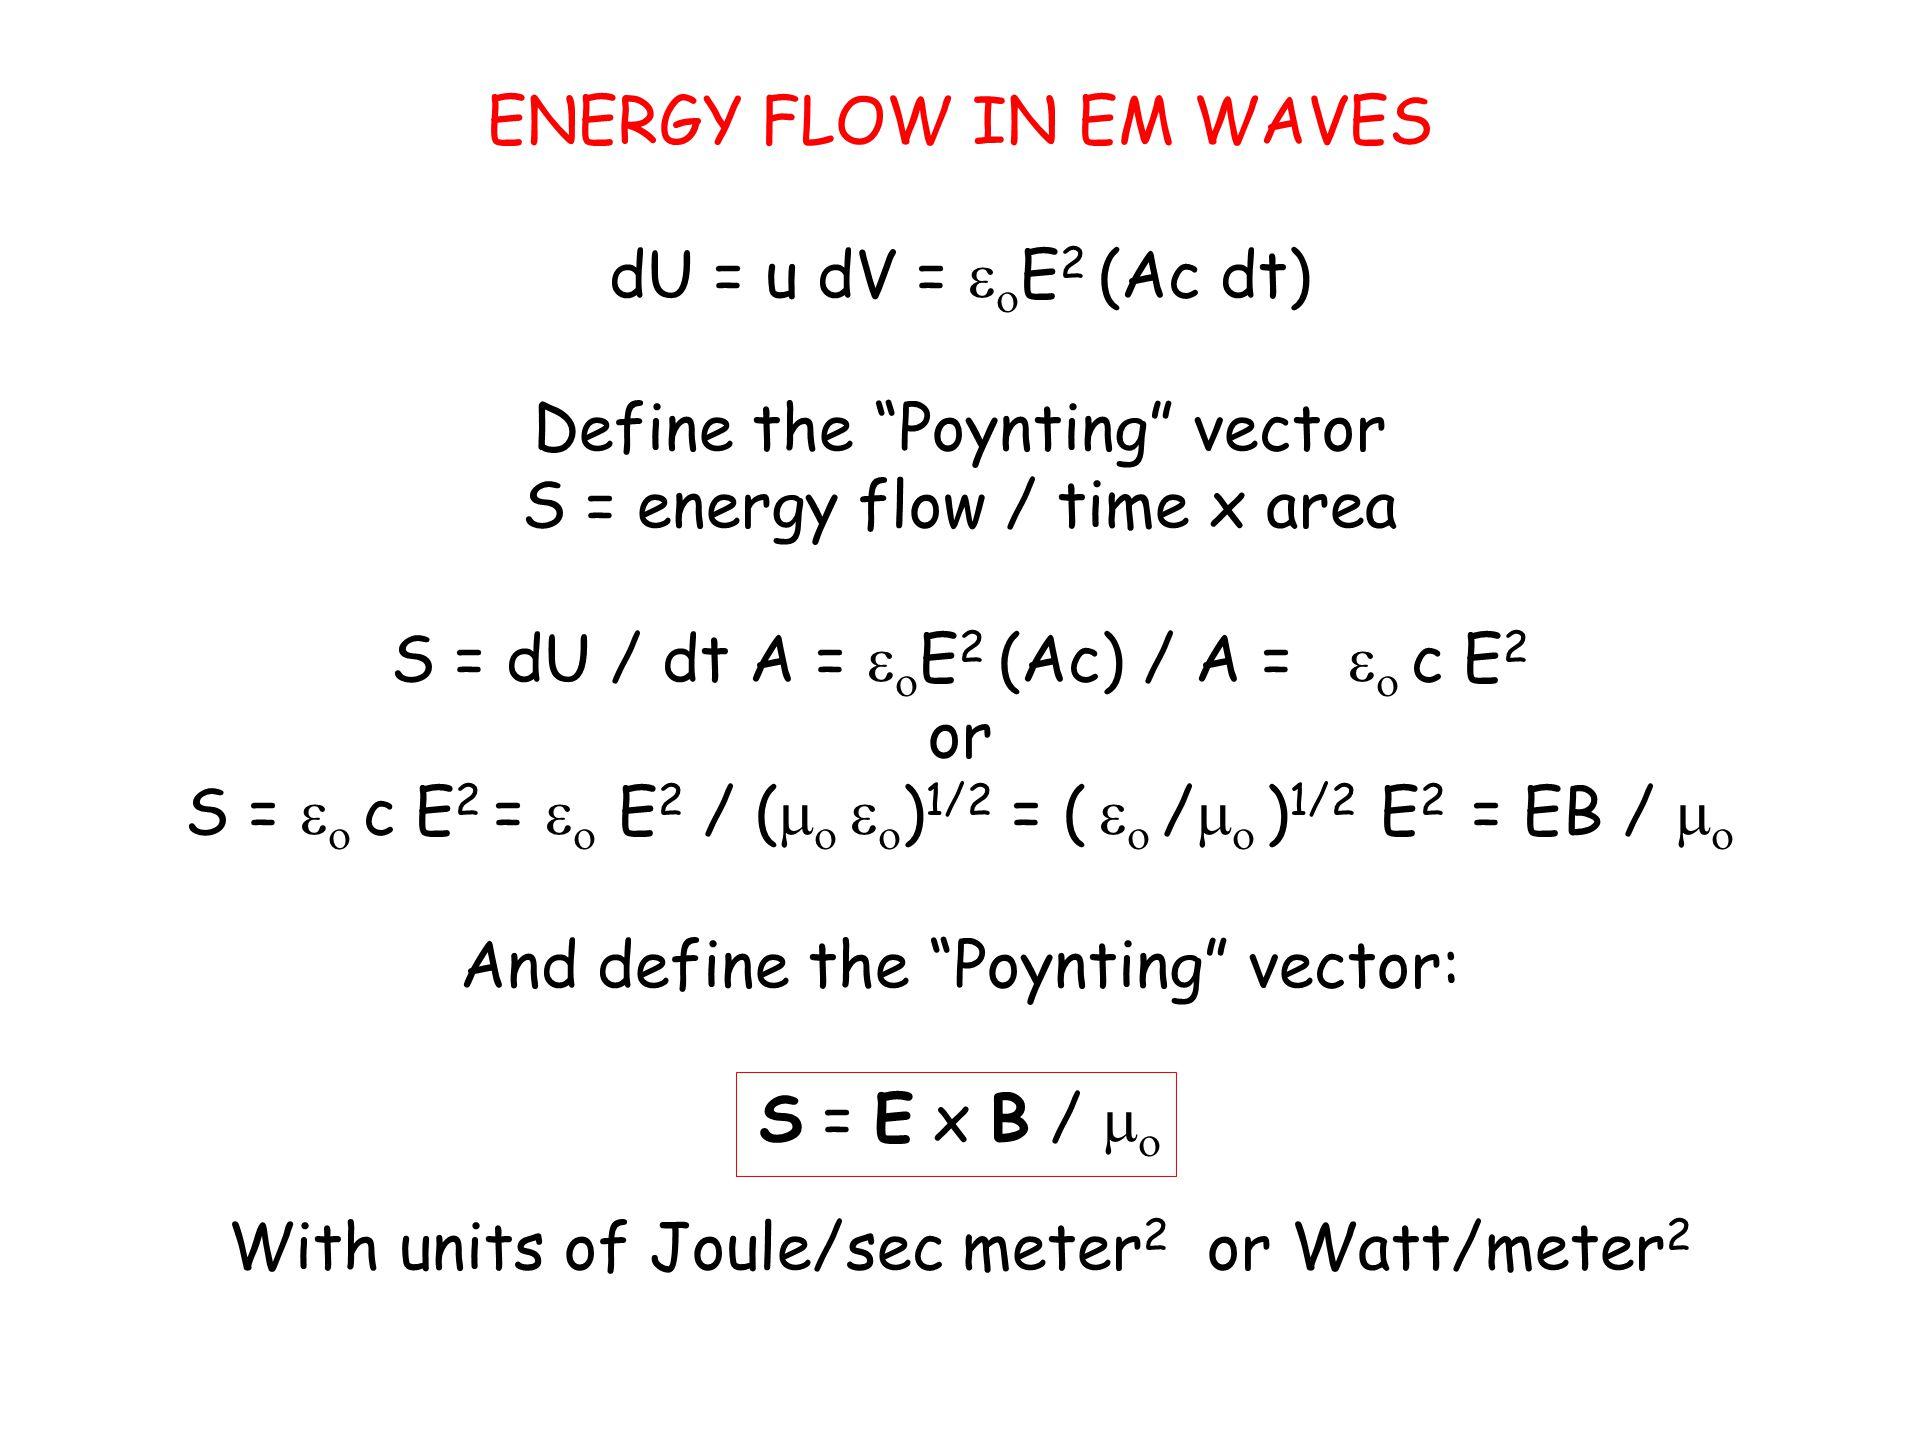 ENERGY FLOW IN EM WAVES dU = u dV =   E 2 (Ac dt) Define the Poynting vector S = energy flow / time x area S = dU / dt A =   E 2 (Ac) / A =    c E 2 or S =   c E 2 =   E 2 / (     ) 1/2 = (   /   ) 1/2  E 2 = EB /   And define the Poynting vector: S = E x B /    With units of Joule/sec meter 2 or Watt/meter 2